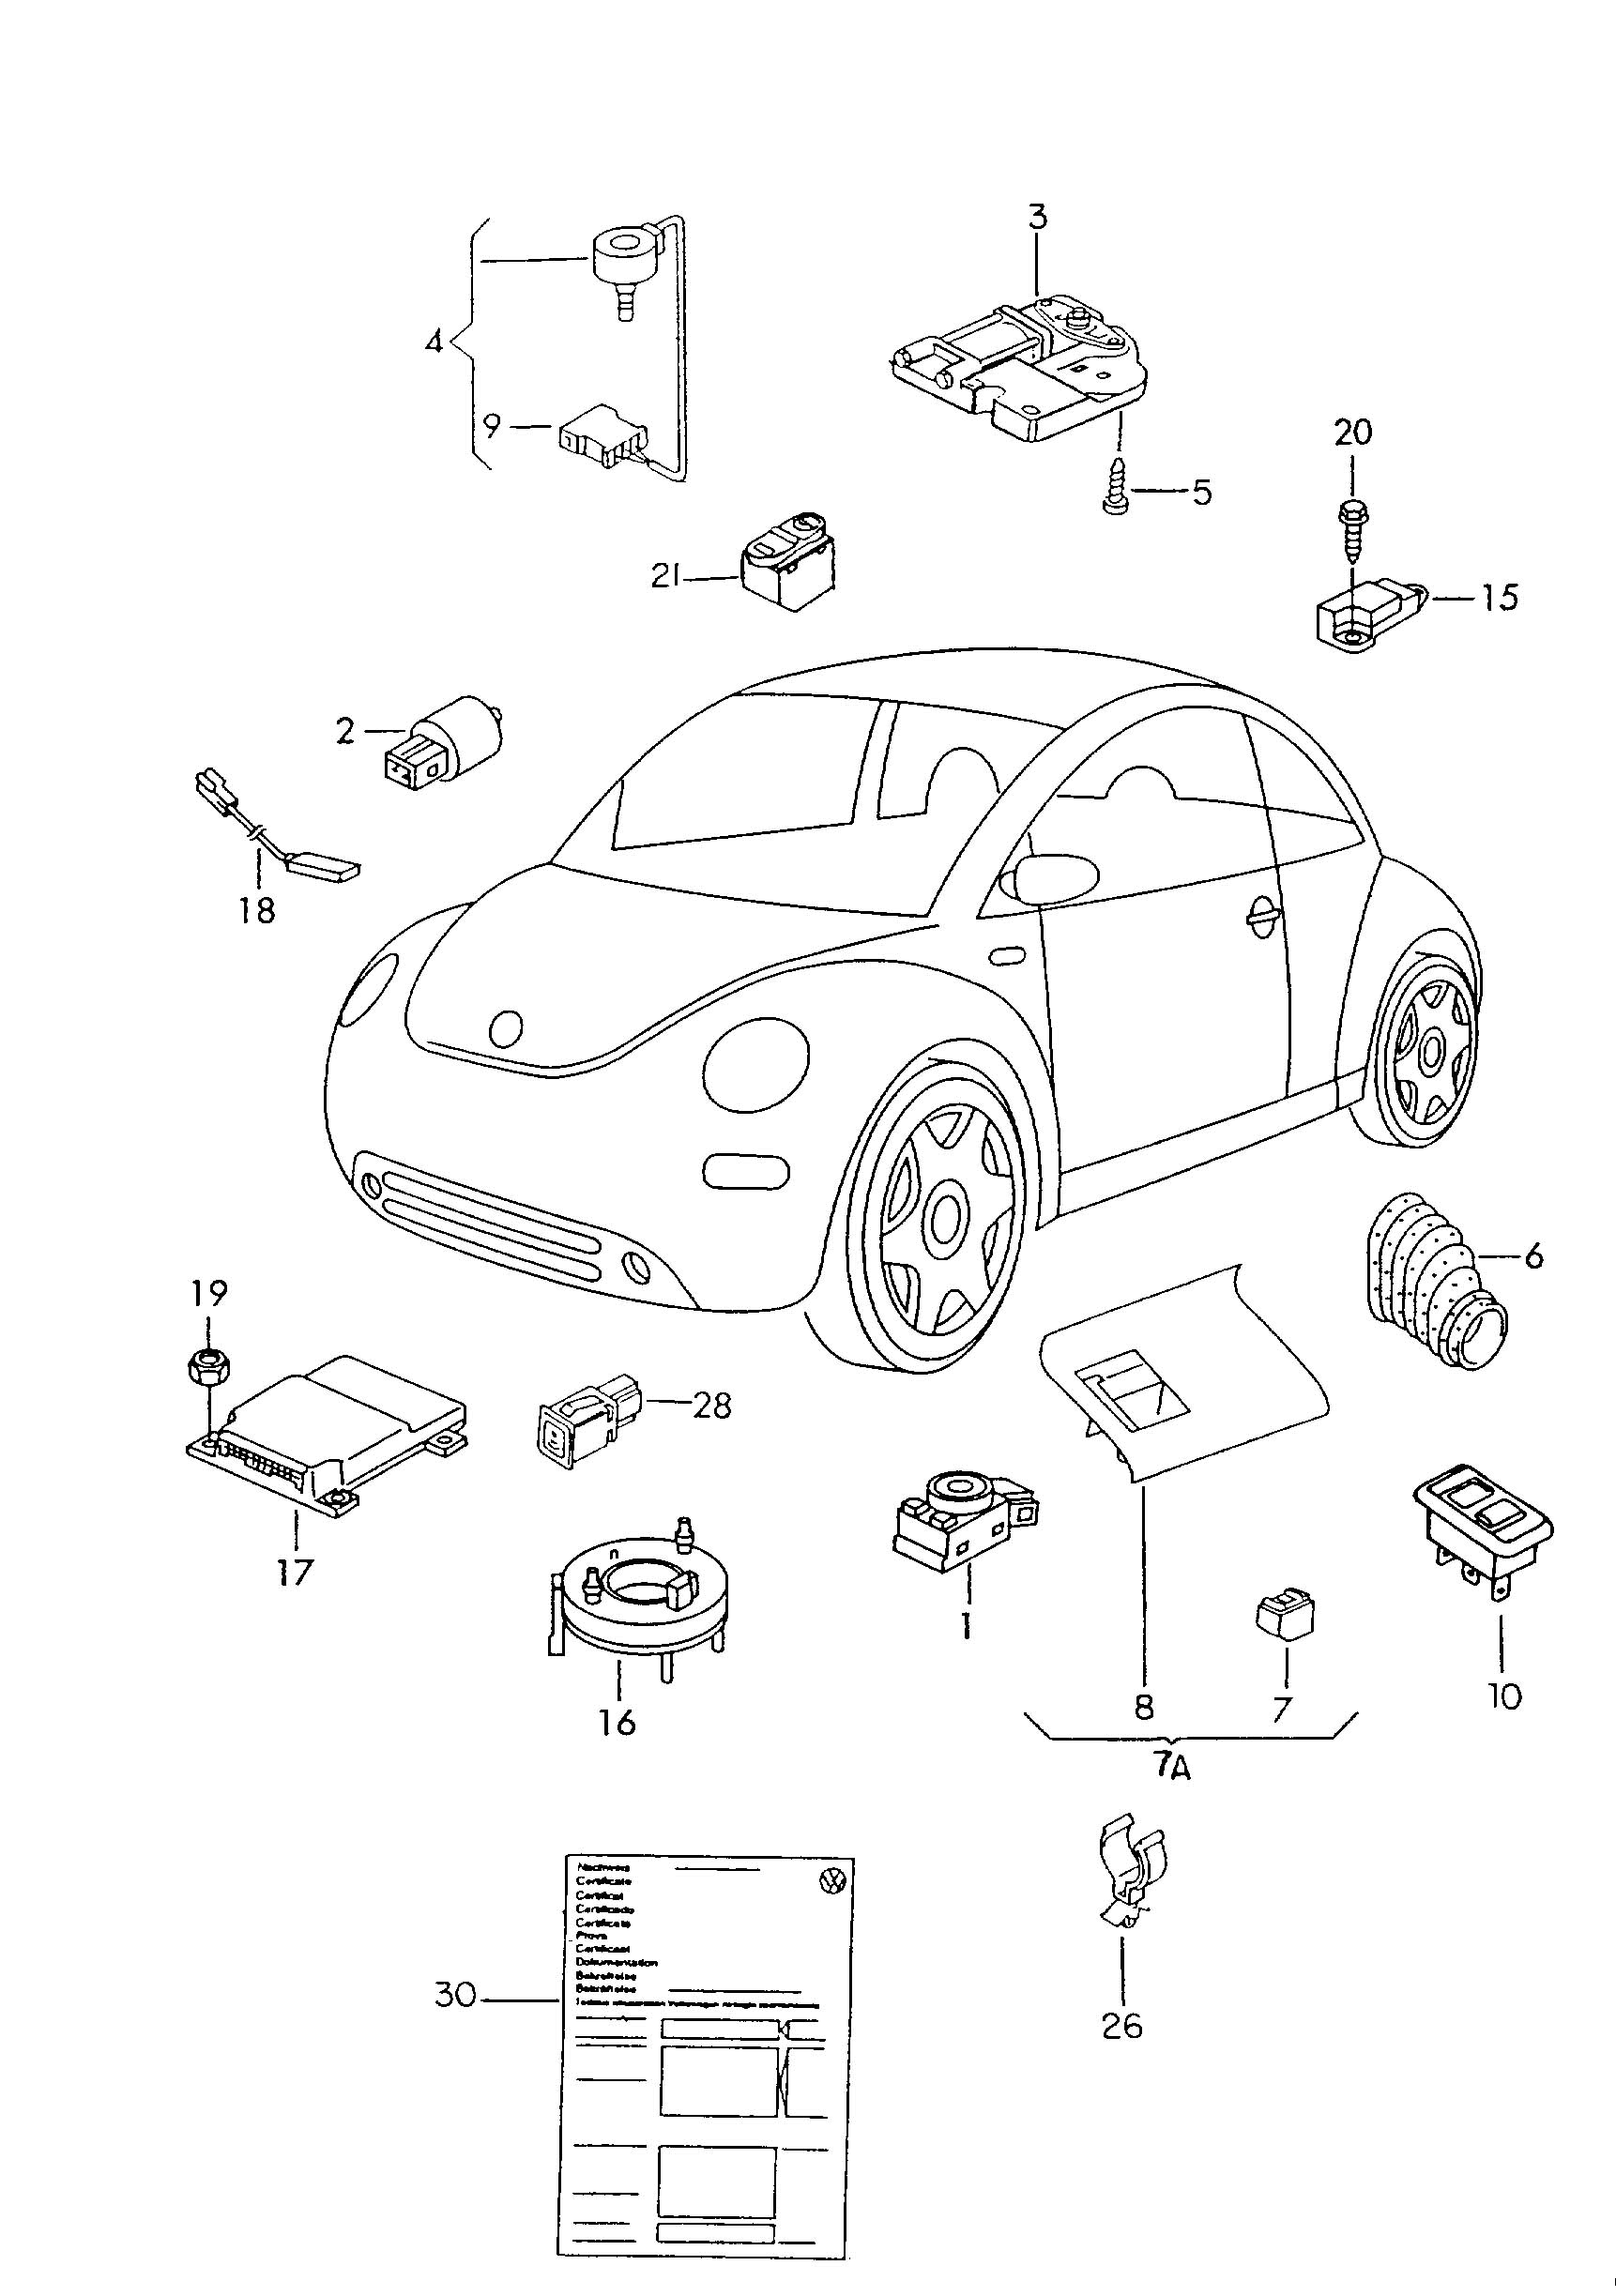 2000 audi a8 wiring diagram